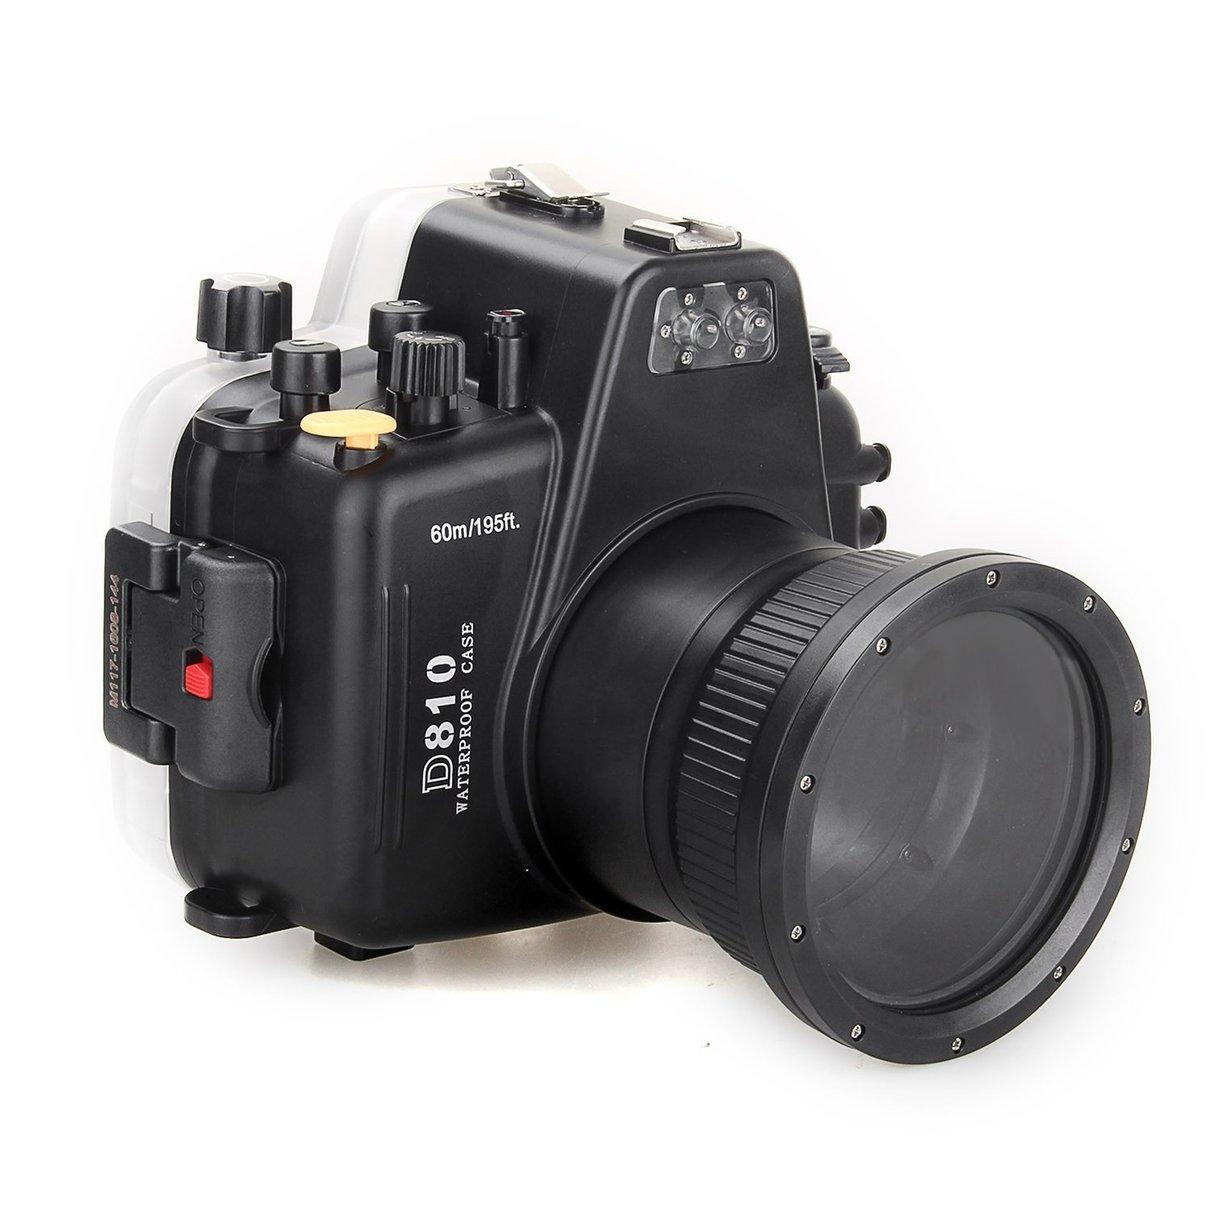 Meikon 60m195ft Waterproof Underwater Camera Housing Case Diving Equipment for Nikon D810